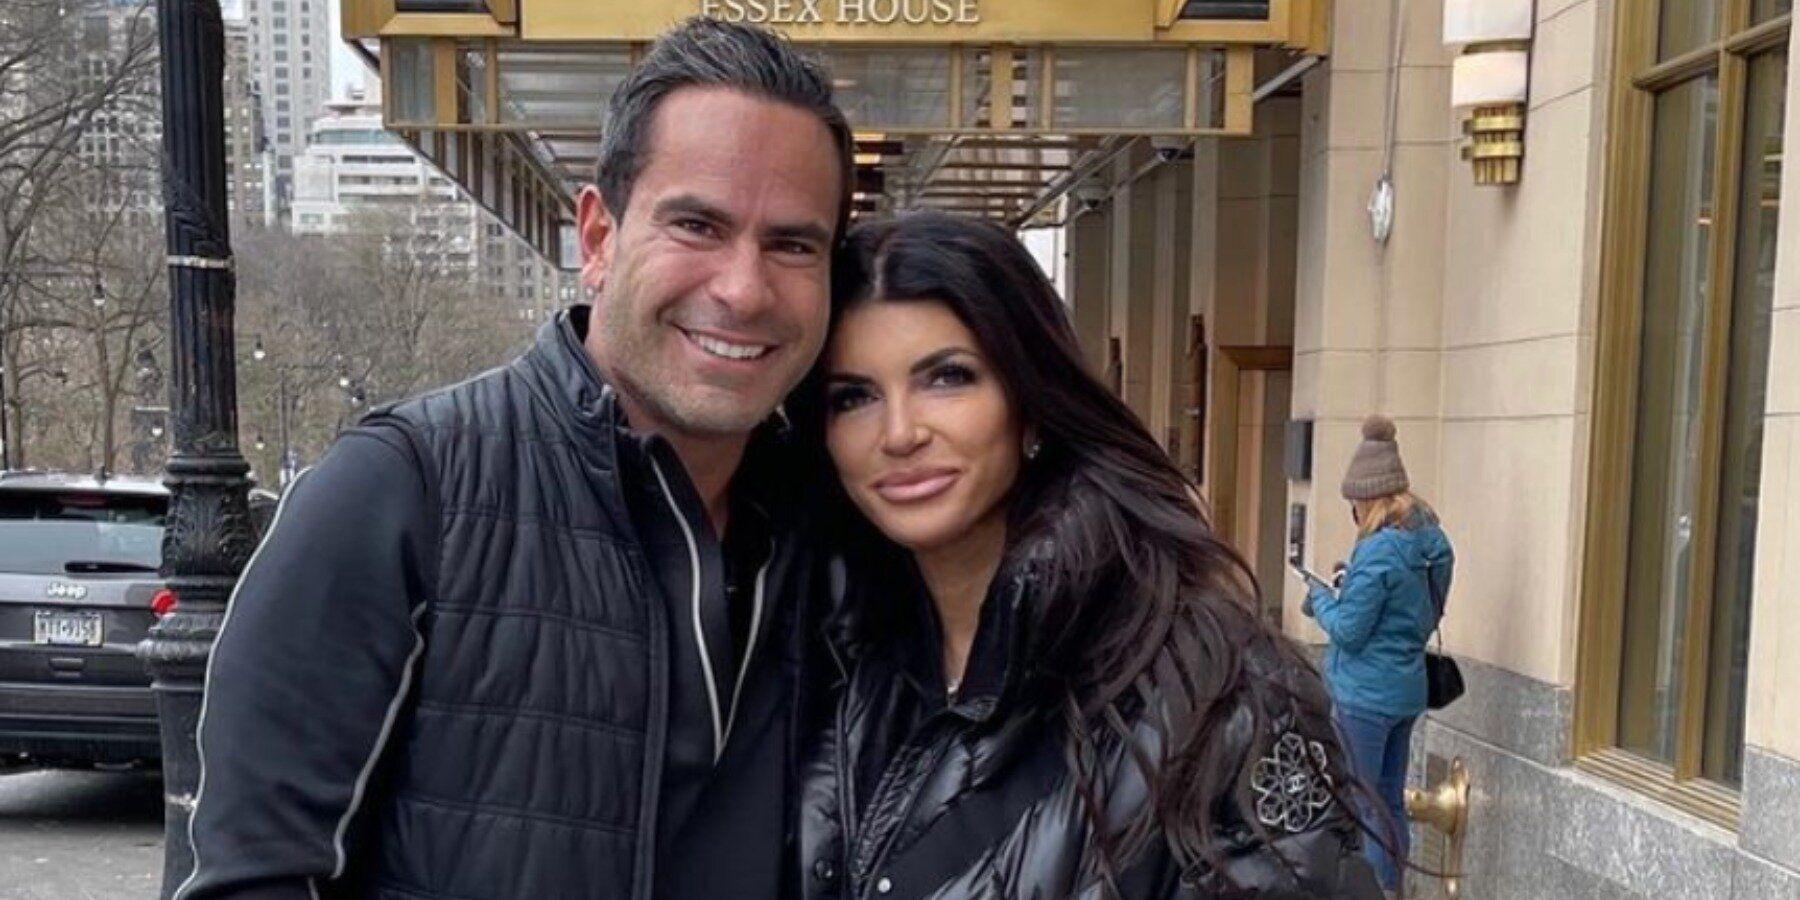 RHONJ: How Fans Learned About Teresa Giudice & Louie Ruelas Engagement